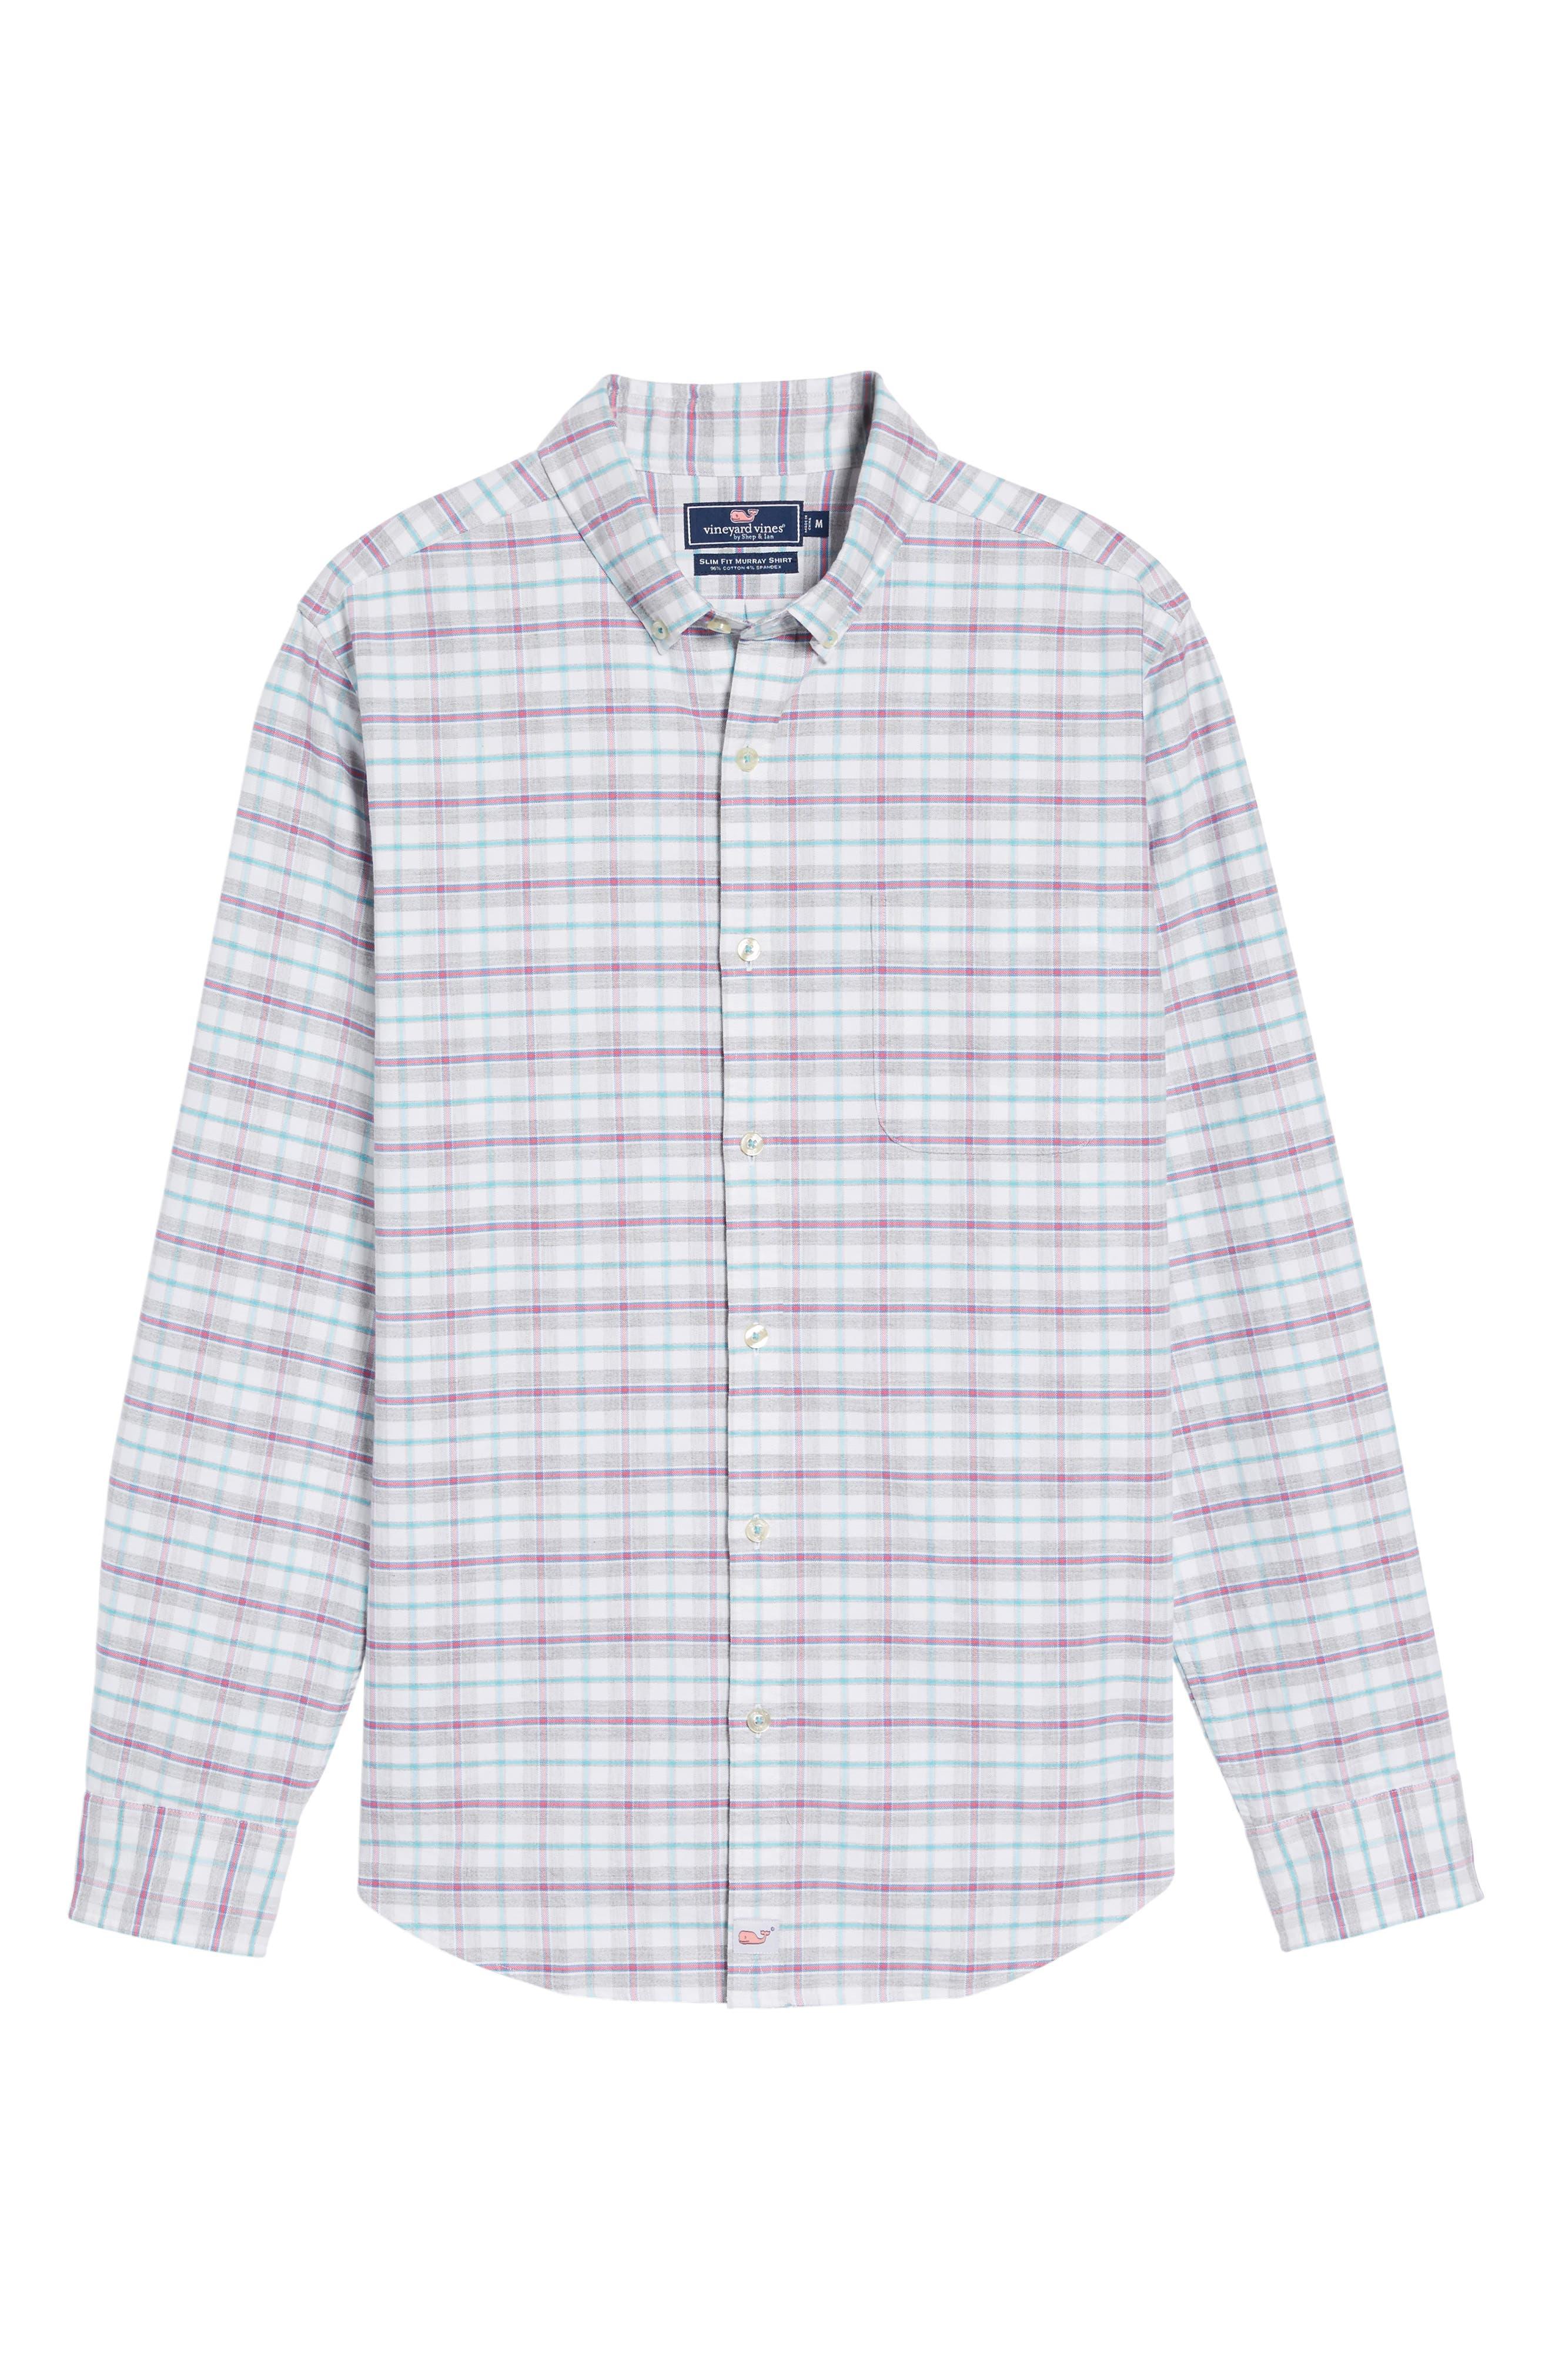 Lockwood Slim Fit Check Sport Shirt,                             Alternate thumbnail 6, color,                             678